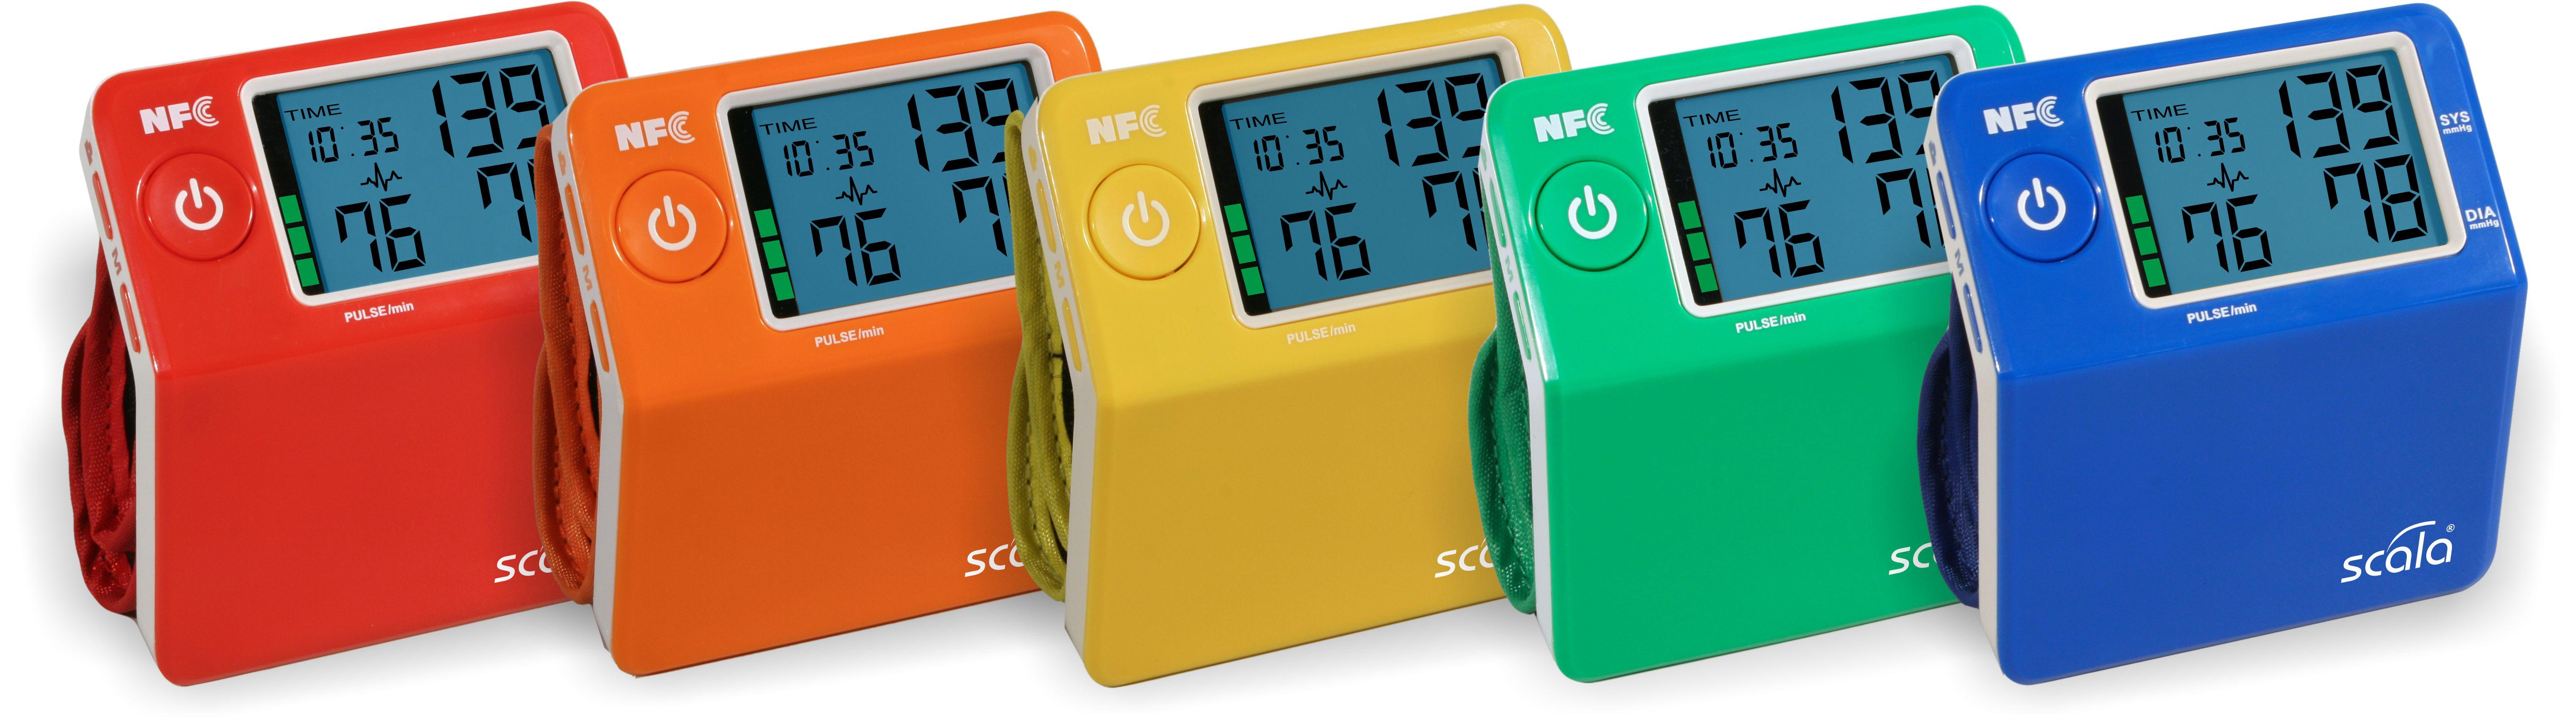 Wrist Blood Pressure Monitor SC 7400 - Scala Webshop